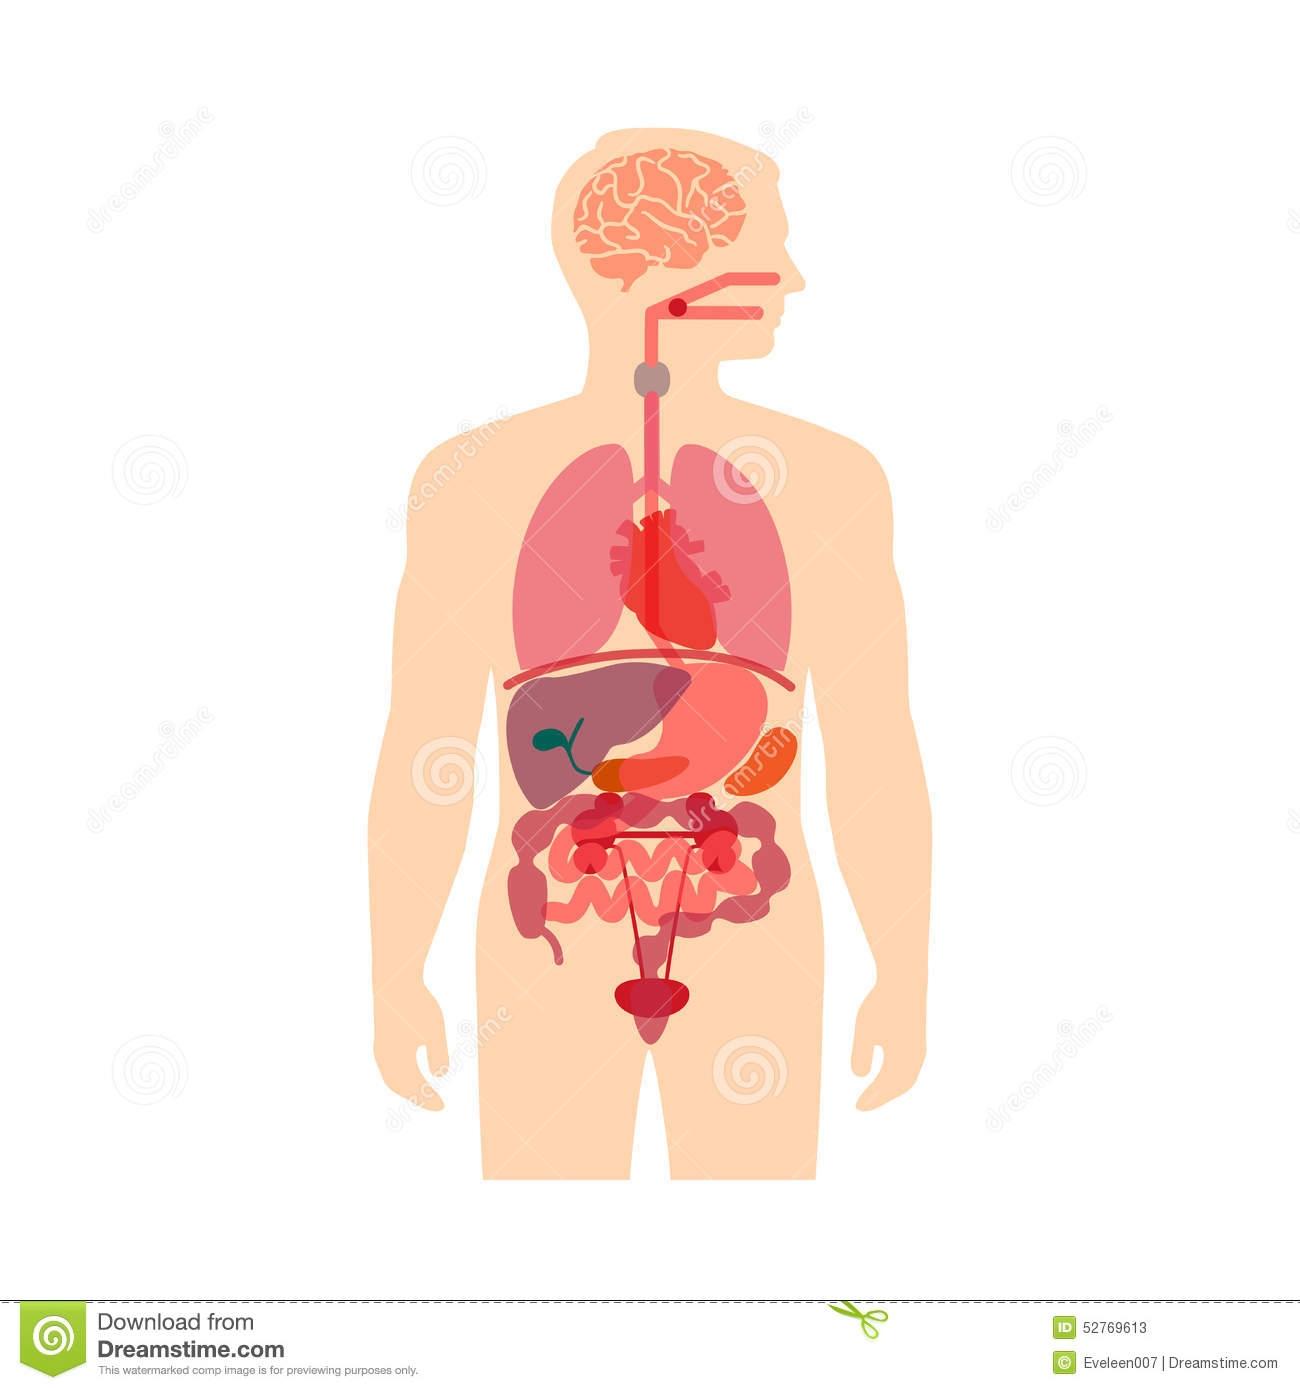 Body clipart organ. System fosfe com clipartfest